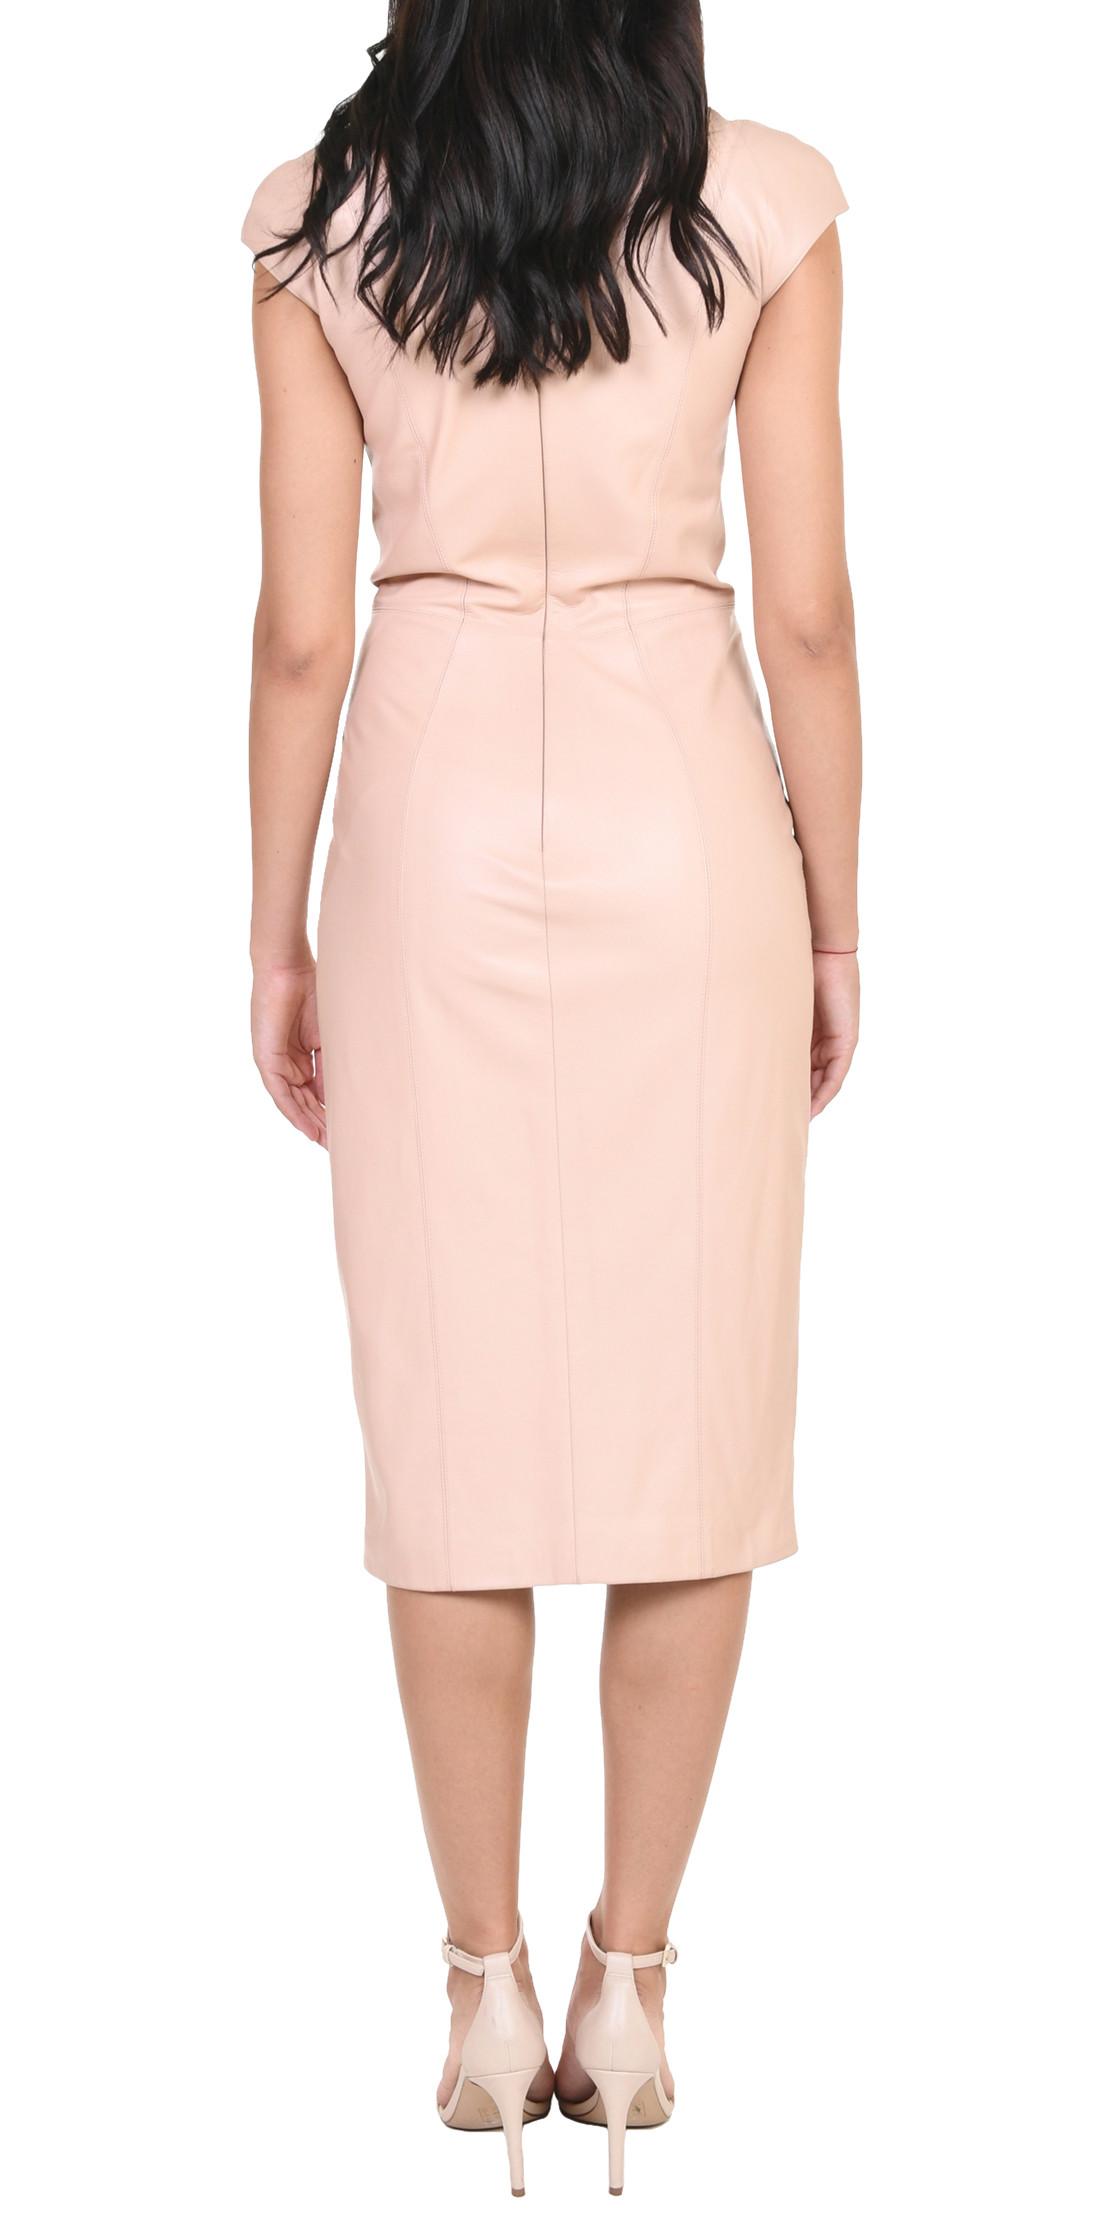 Contemporáneo Reem Acra Cocktail Dress Molde - Ideas de Estilos de ...